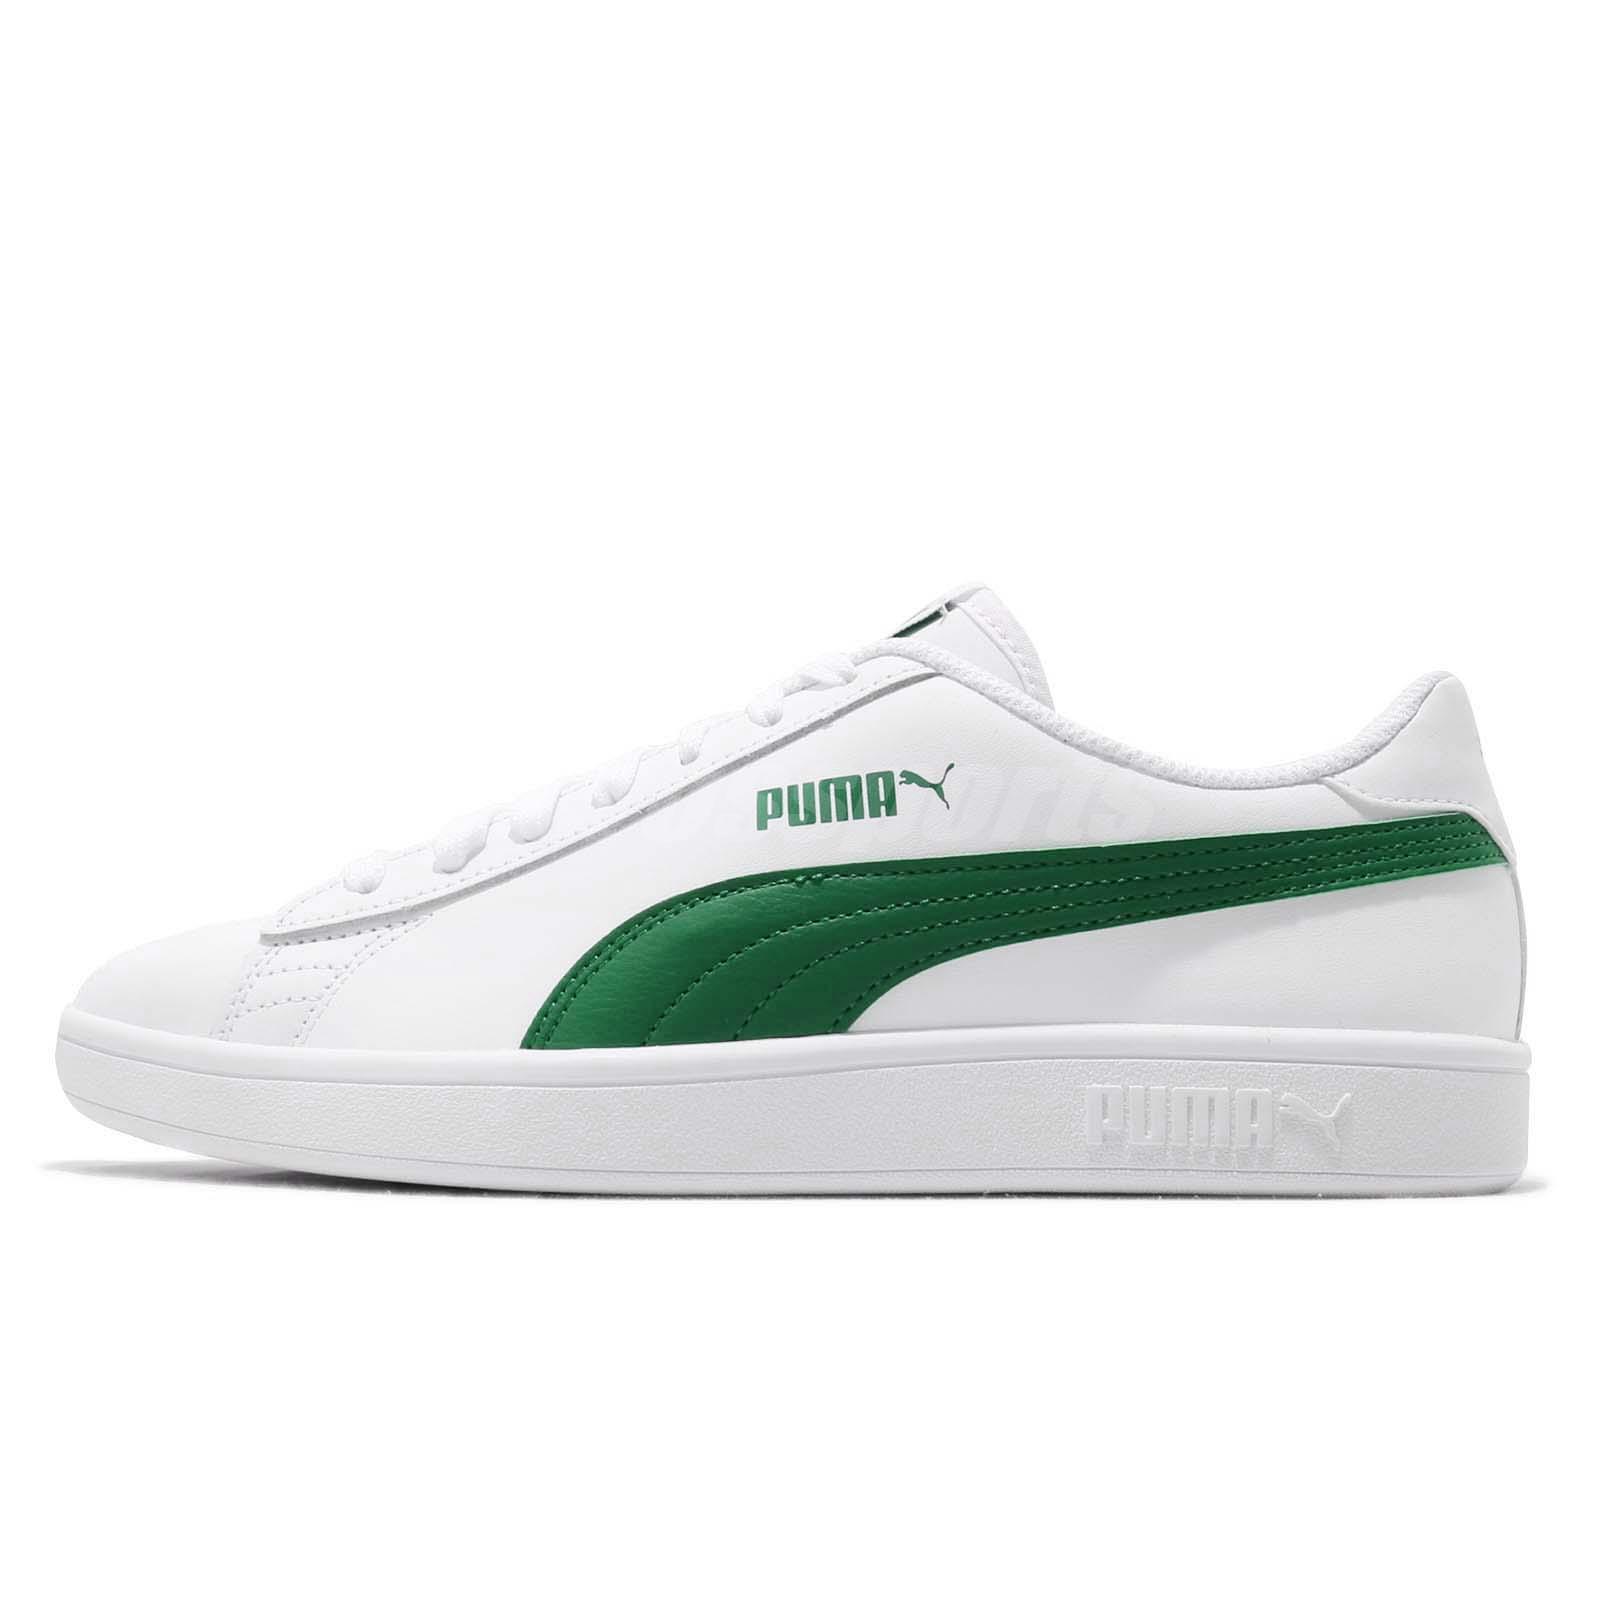 4b512a005b7a15 Puma Smash V2 L White Amazon Green Men Women Casual Shoes Sneakers 365215-03